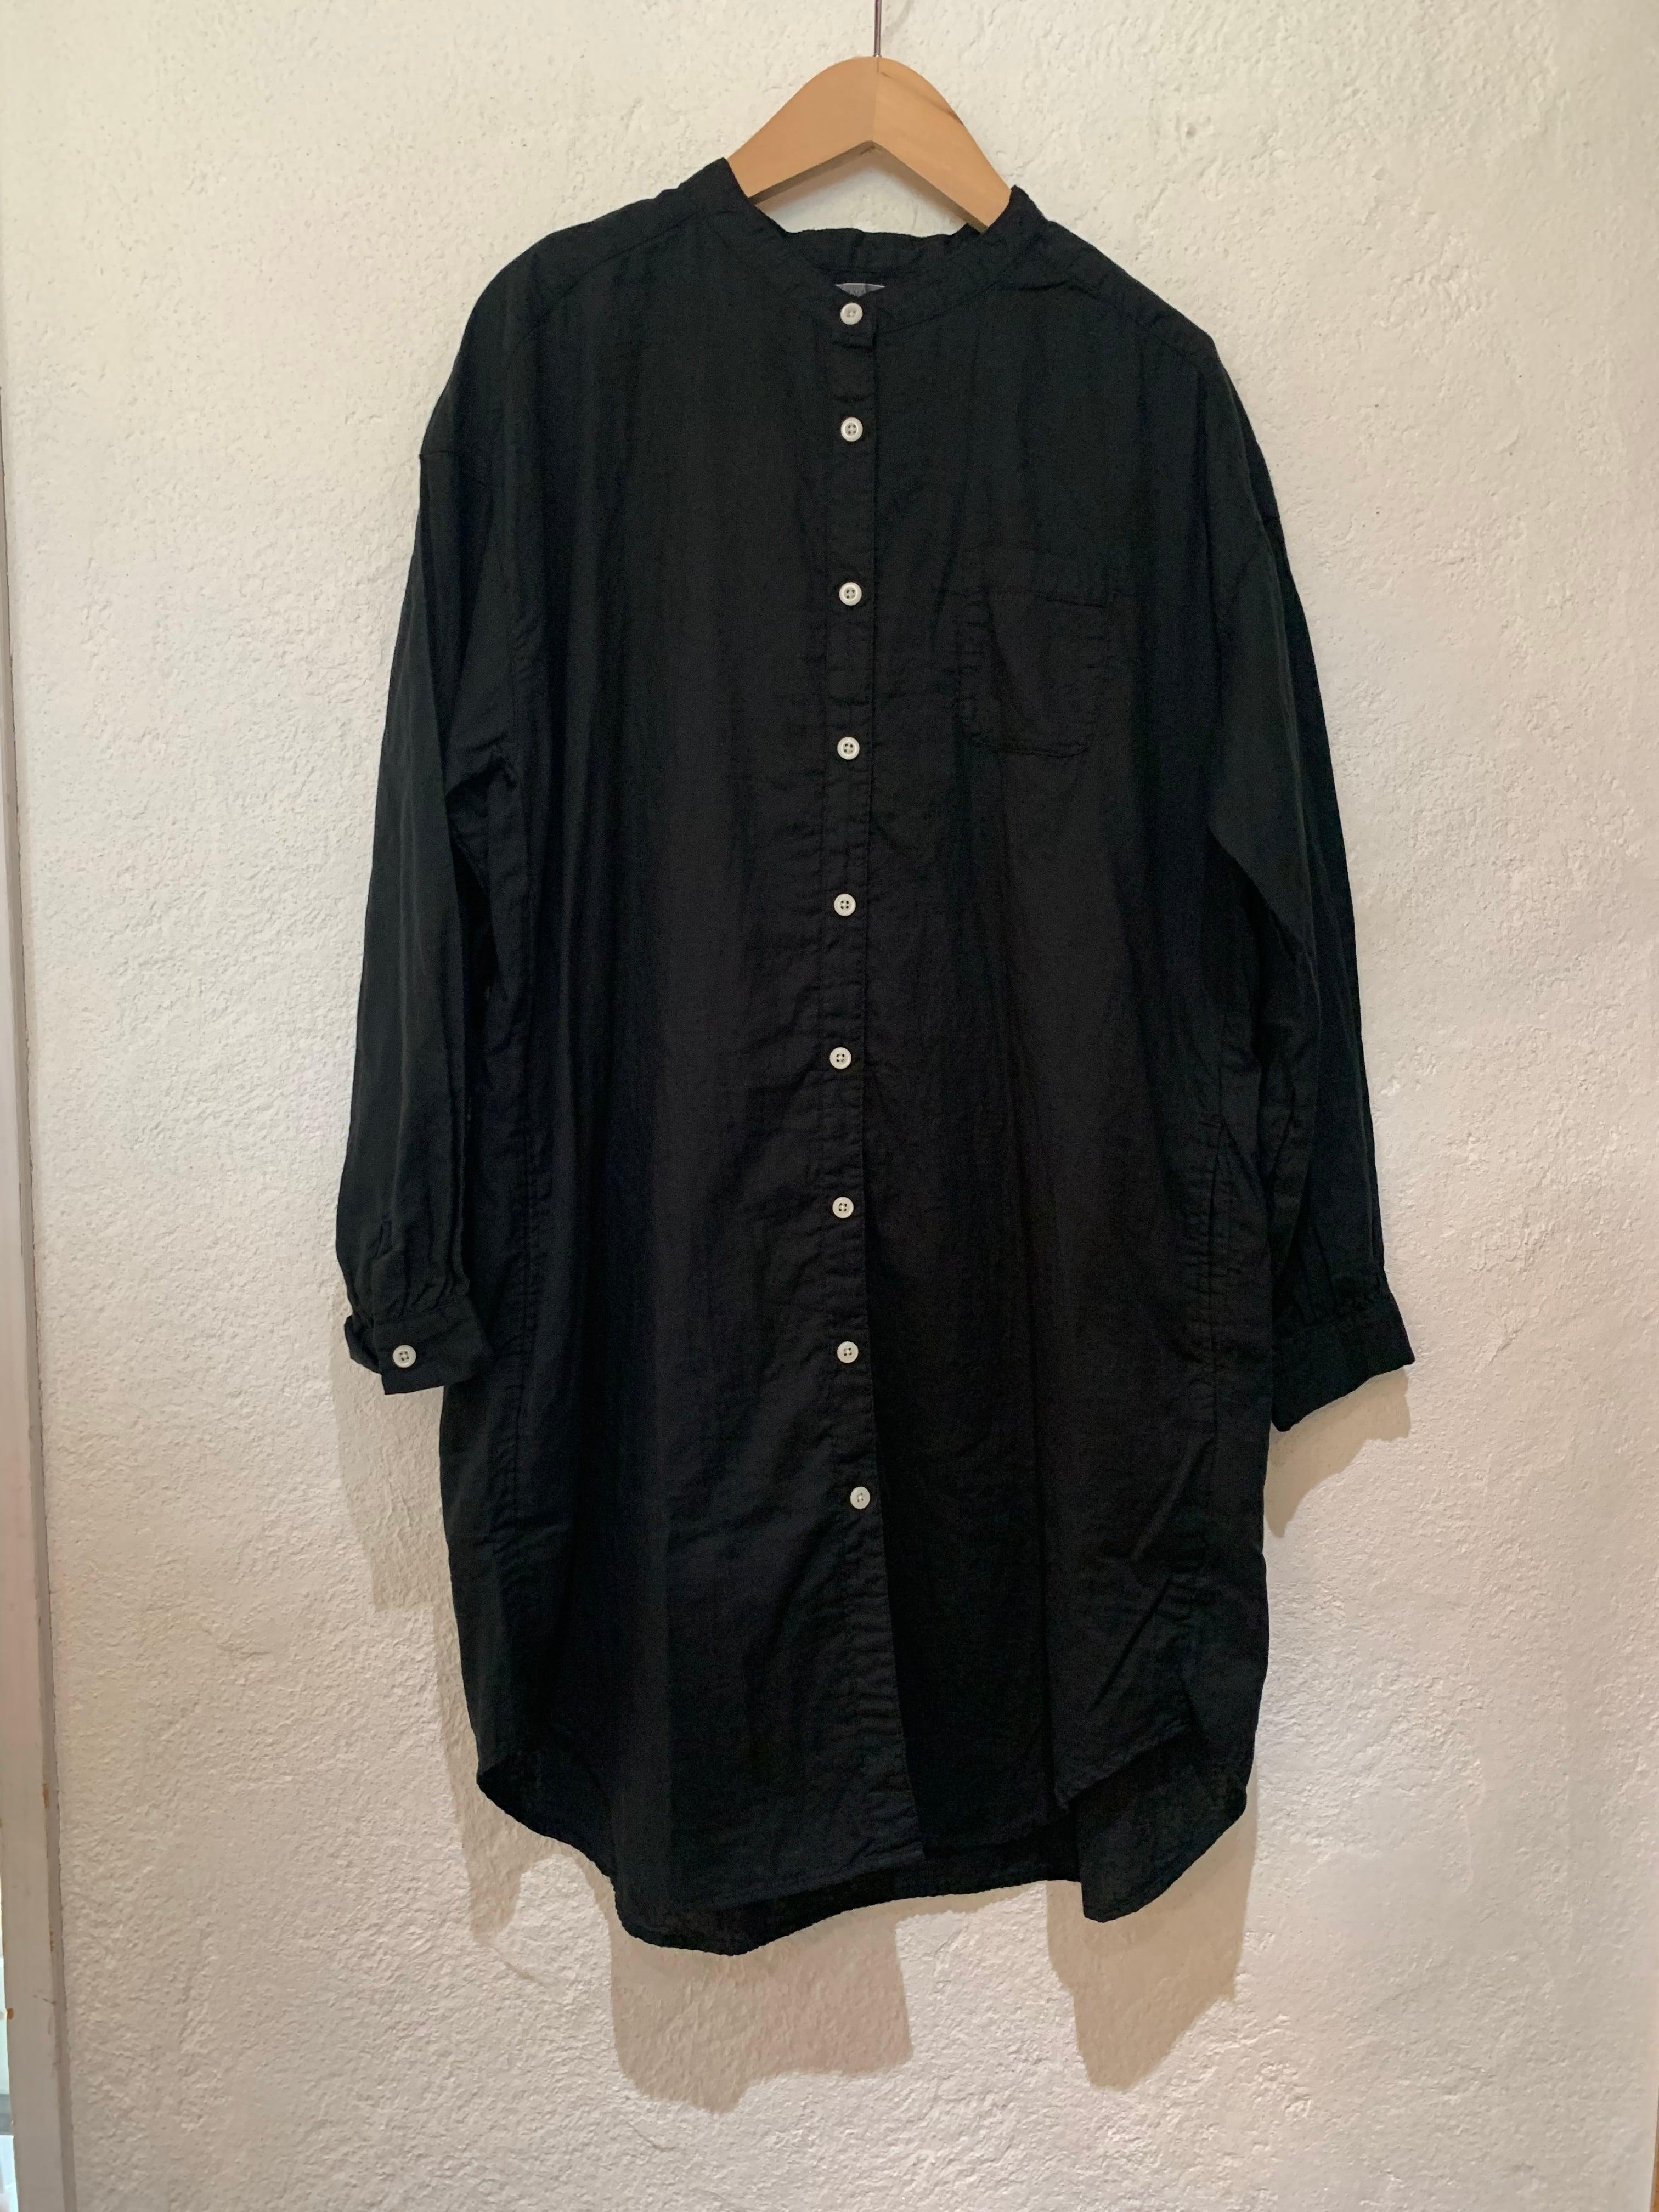 SANVALLEY/ダブルガーゼスタンドシャツ ブラック